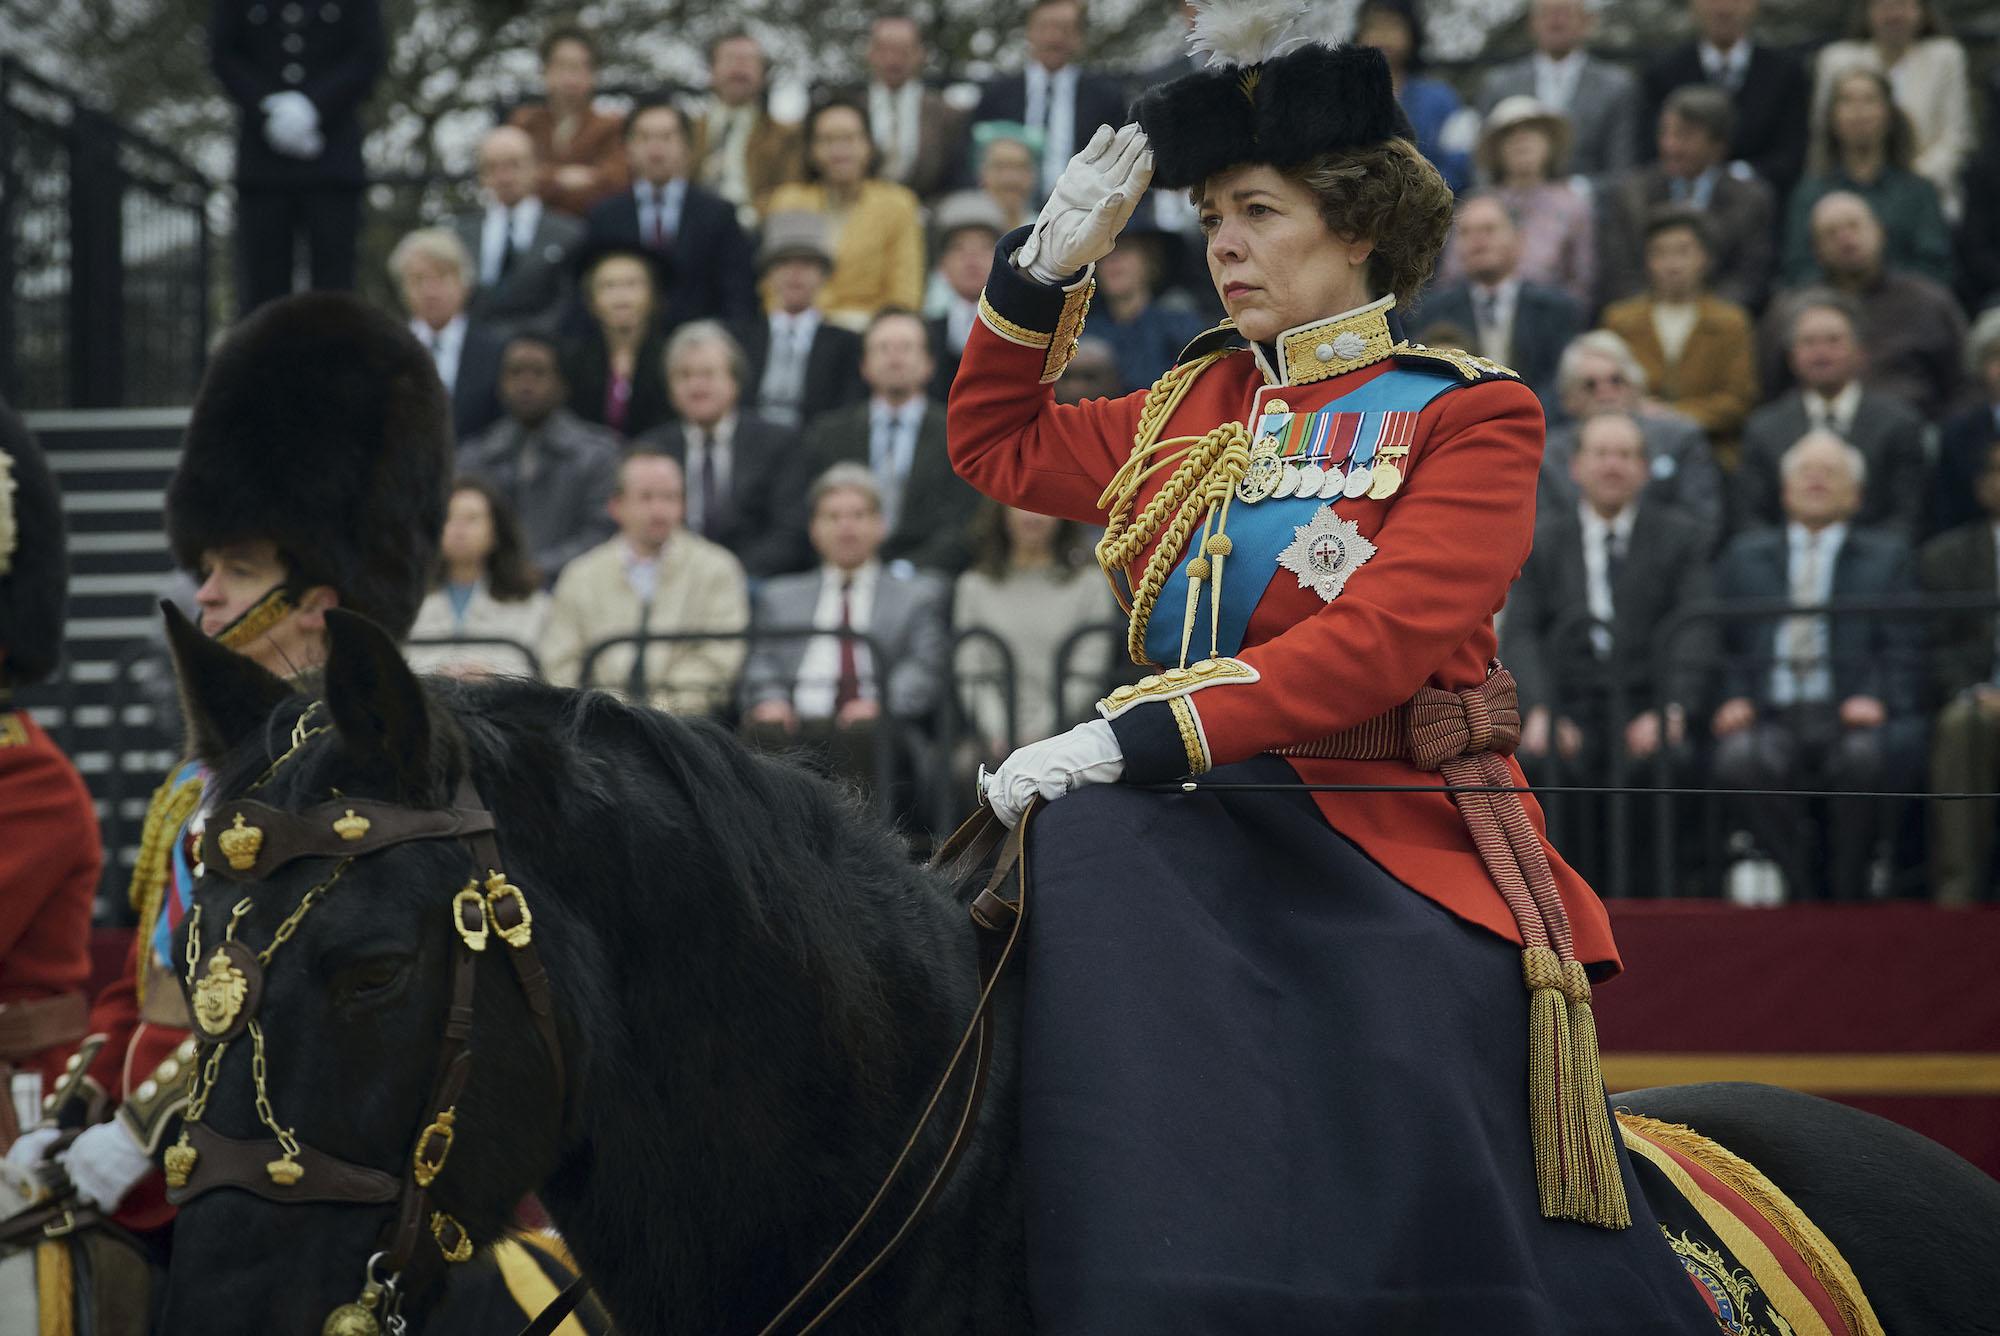 Olivia Colman as Queen Elizabeth II in 'The Crown' Season 4.